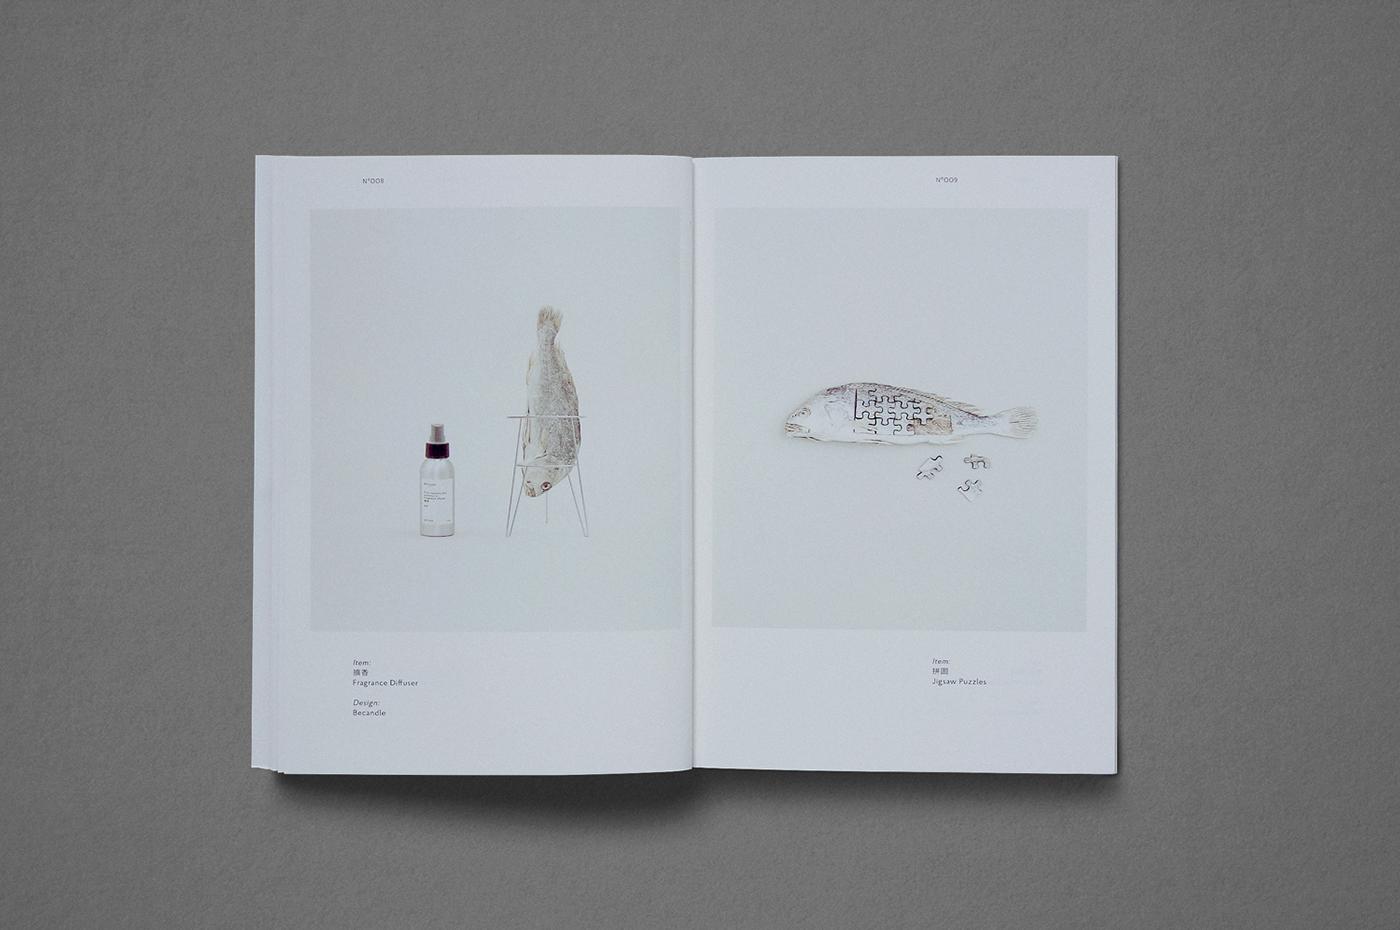 innoise Hong Kong salted fish jerry luk Exhibition Design  visual identity Logo Design minimal logo